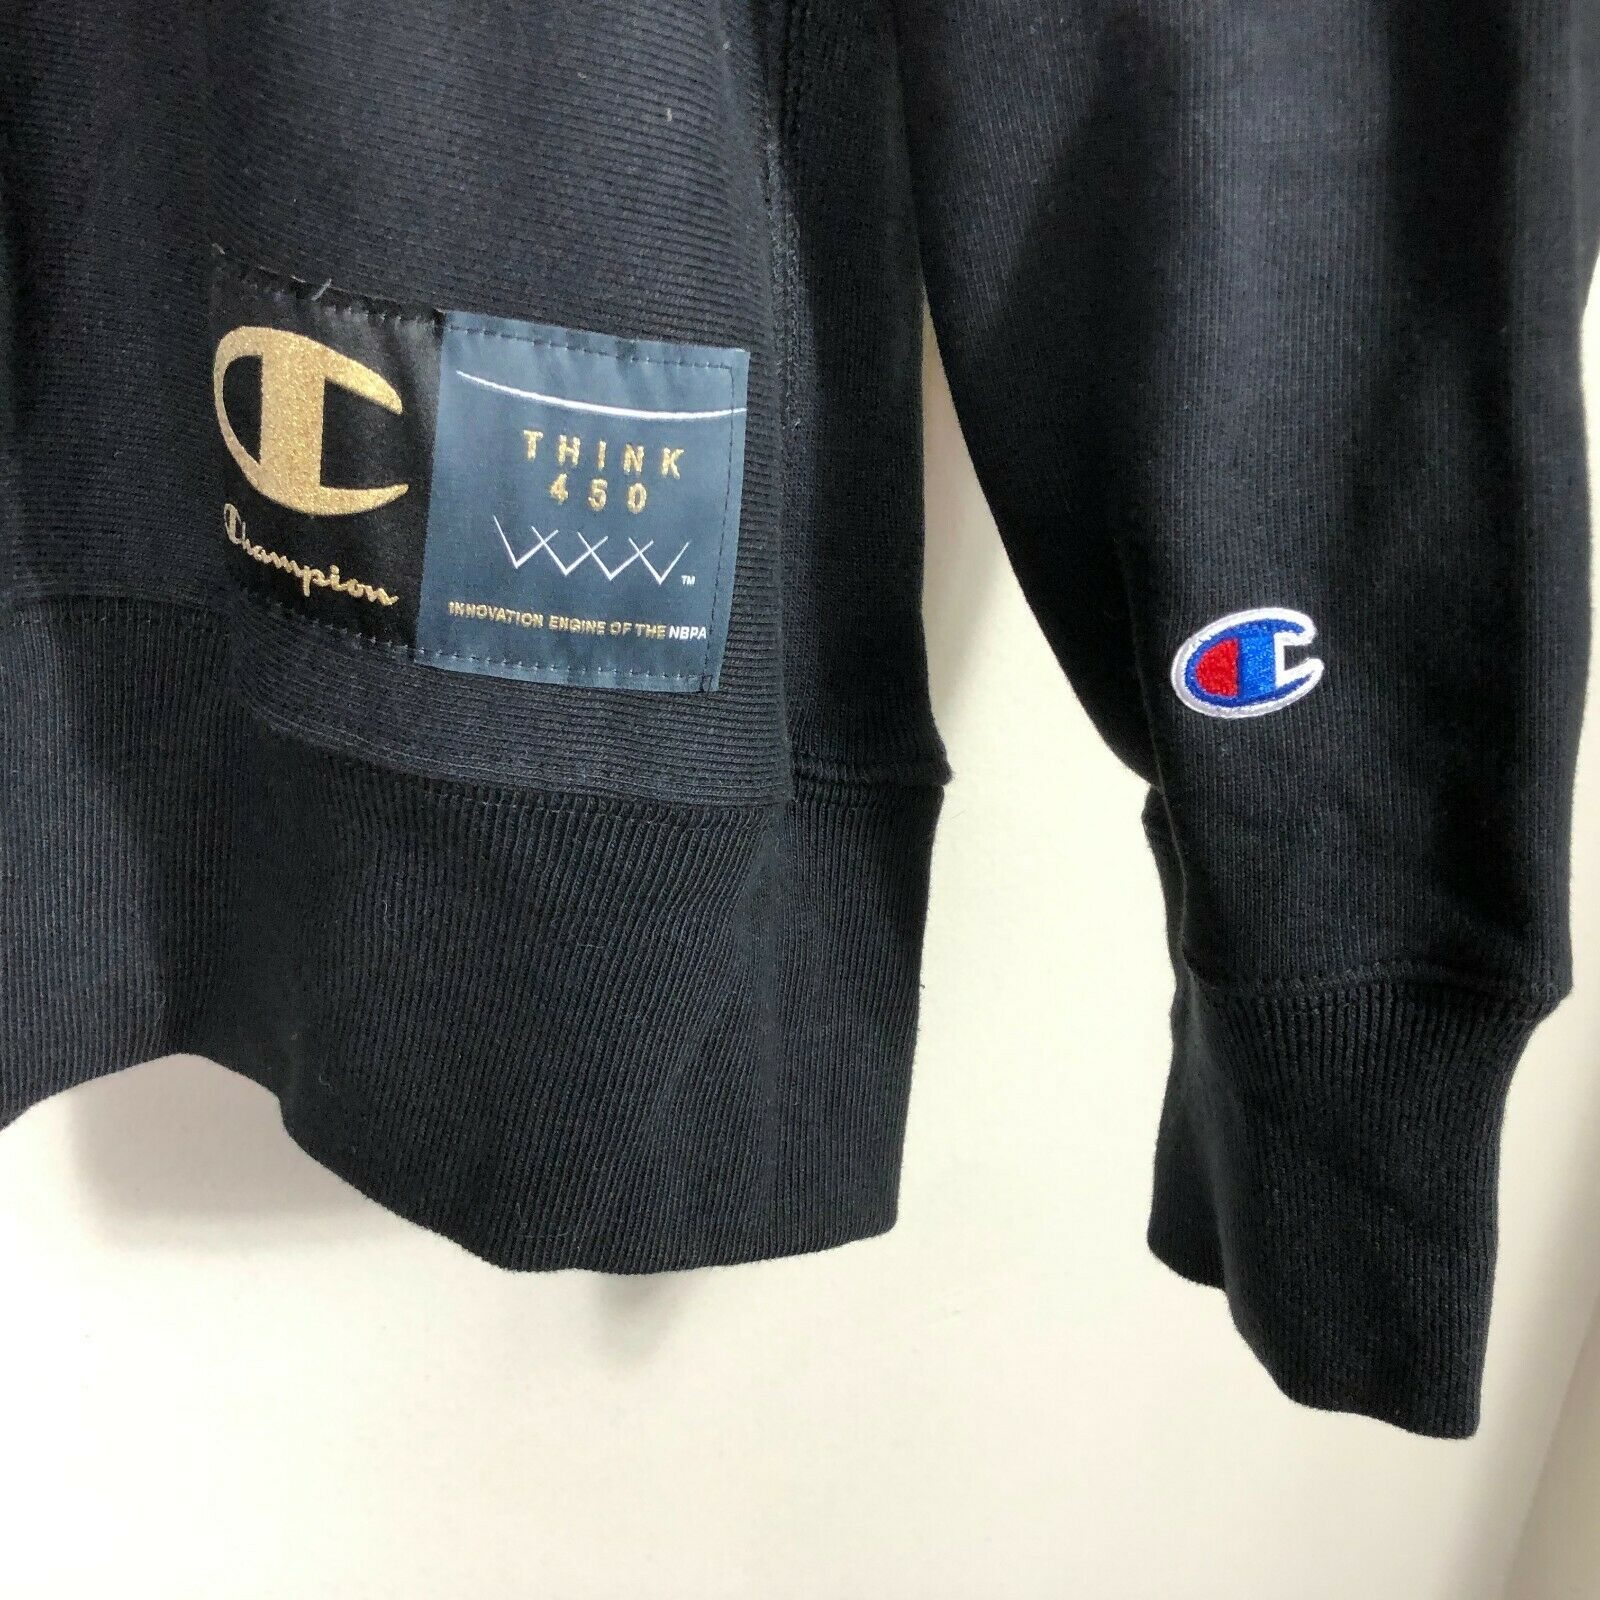 Vintage Champion Crew Neck Reverse Weave Sweatshirt XL NBA NBPA Sweatshirt image 4